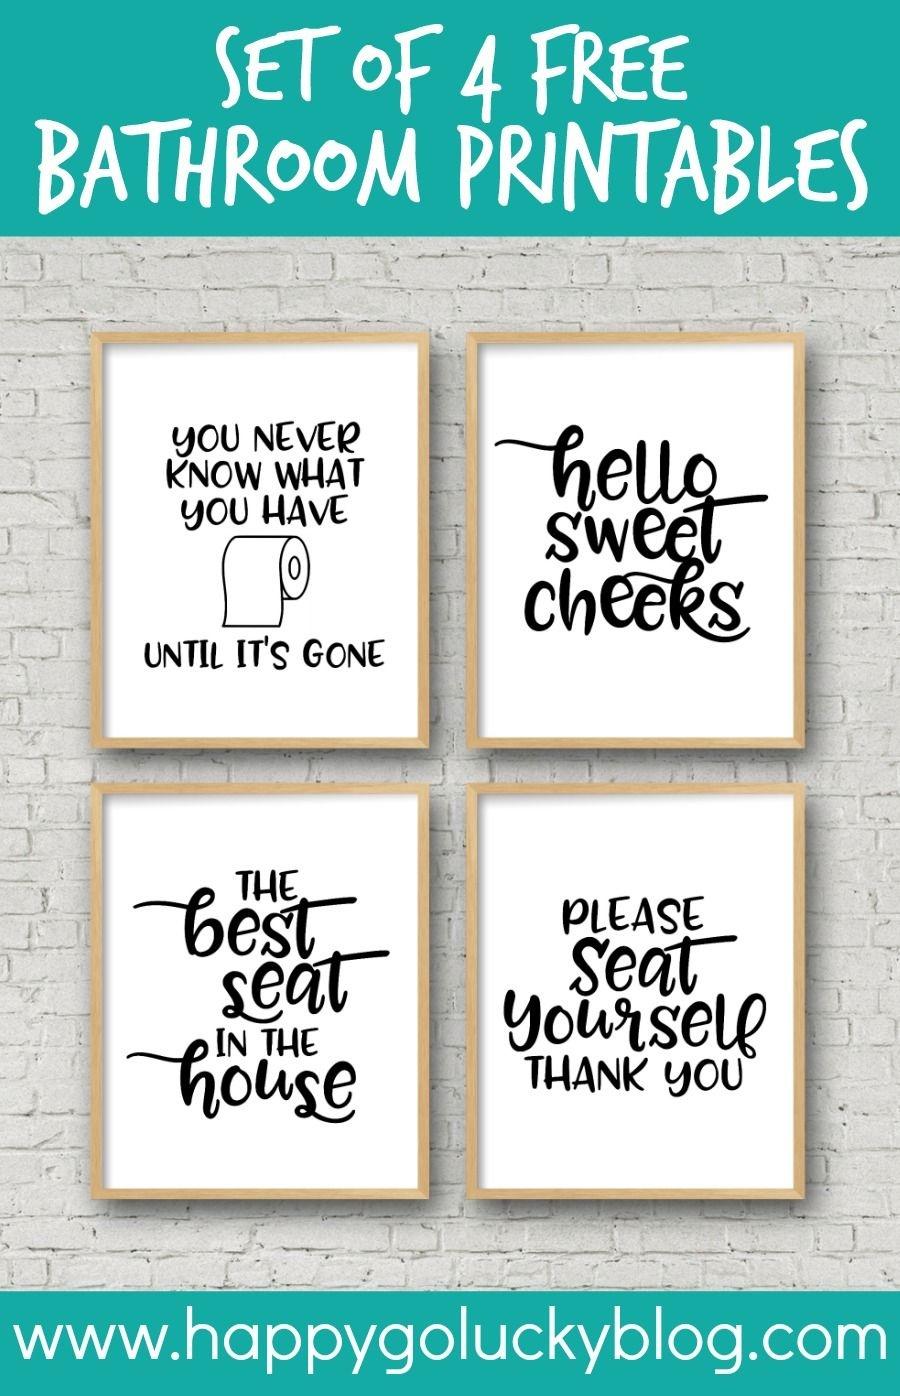 Set Of 4 Printable Bathroom Signs | Crafts-Printables | Funny - Free Funny Bathroom Printables